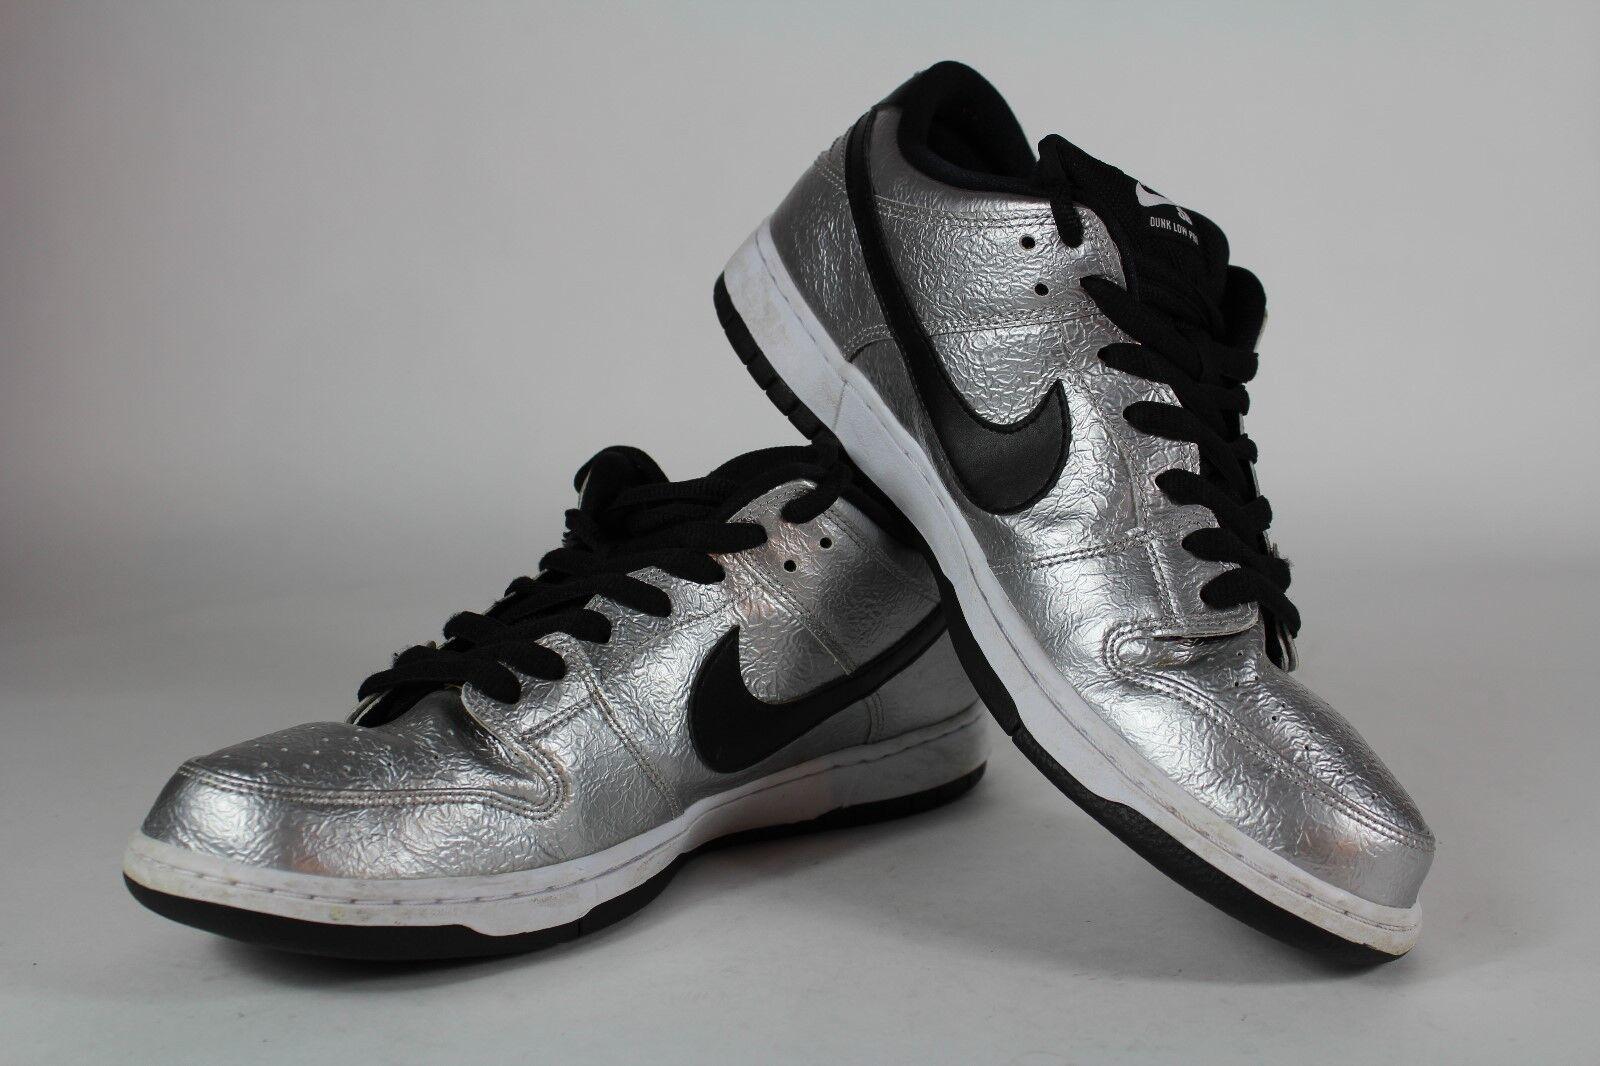 Nike SB Premium Dunk Low Cold Pizza Mens 12 12 12 Metallic Silver EUC A00 54dcf9